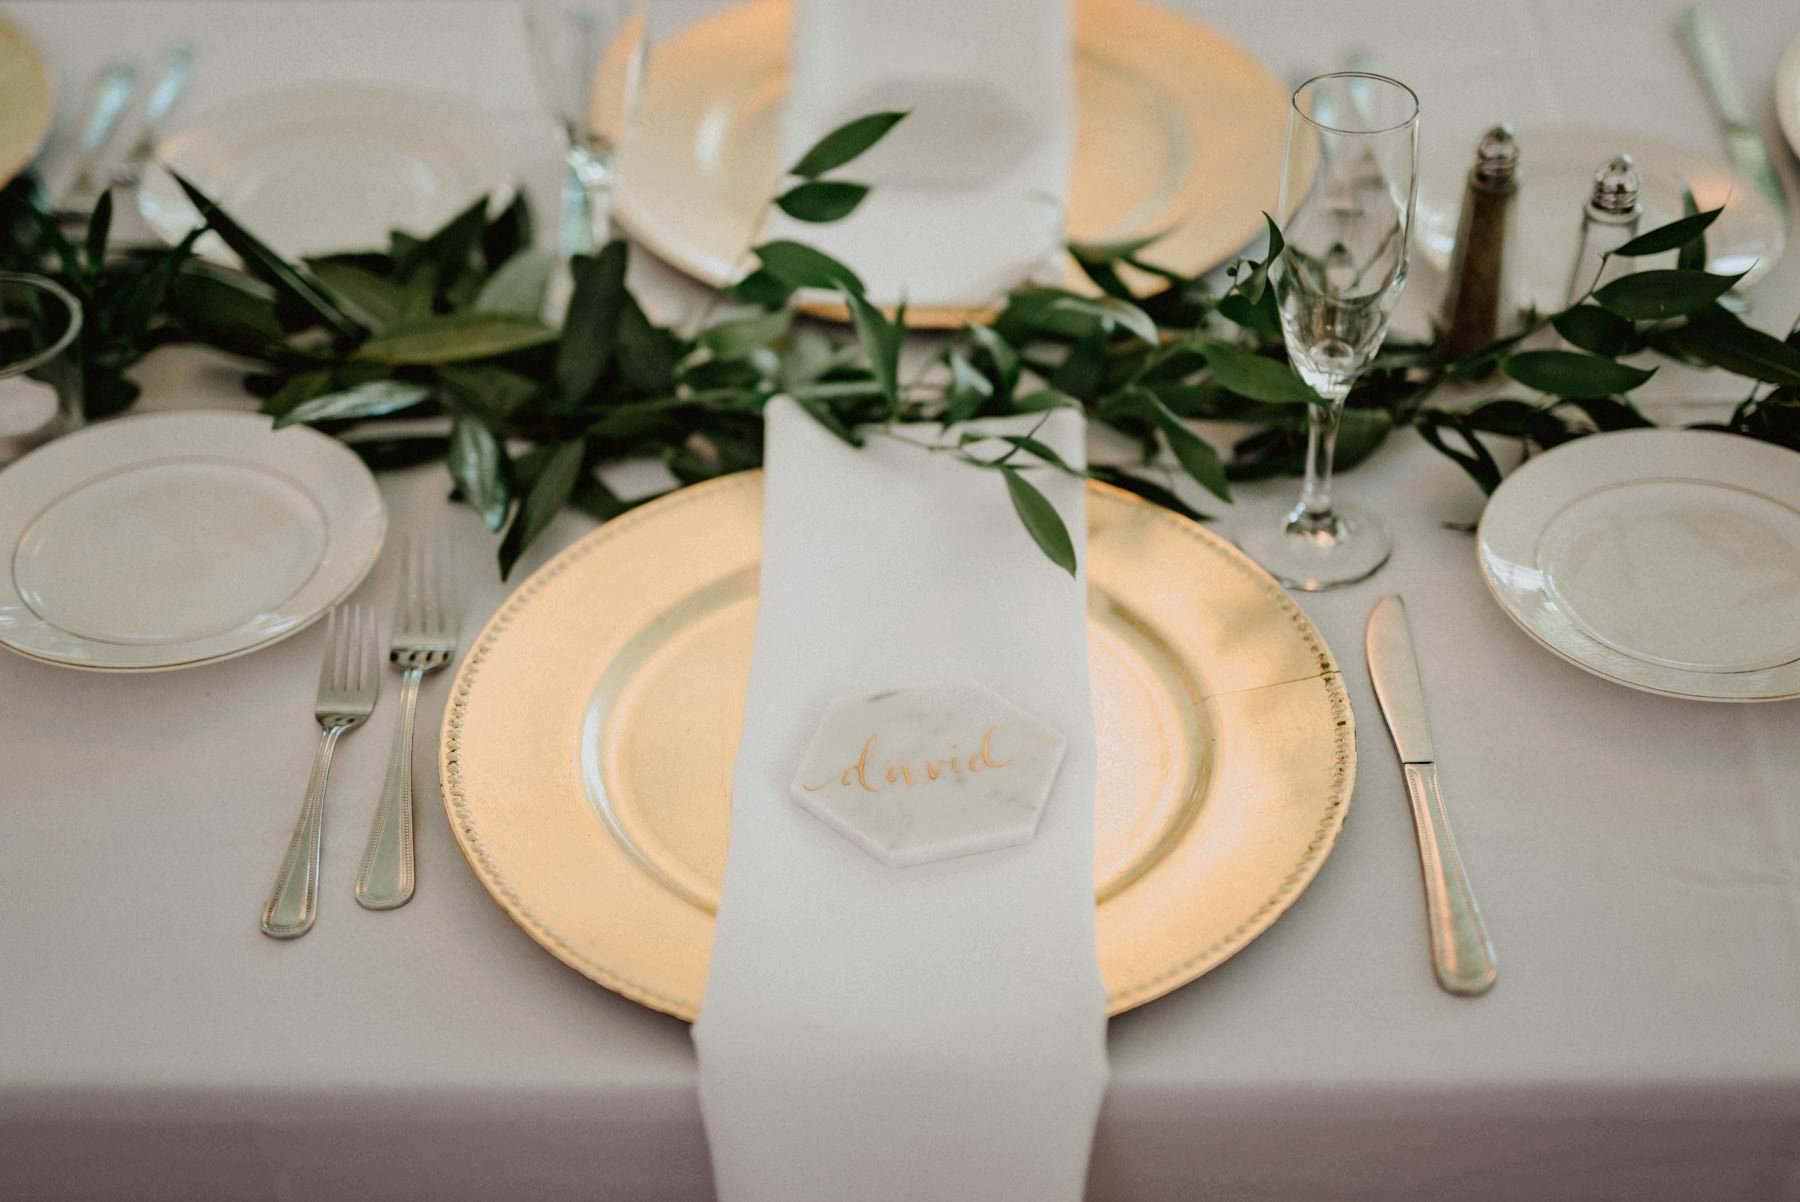 Appleford-estate-wedding-76.jpg